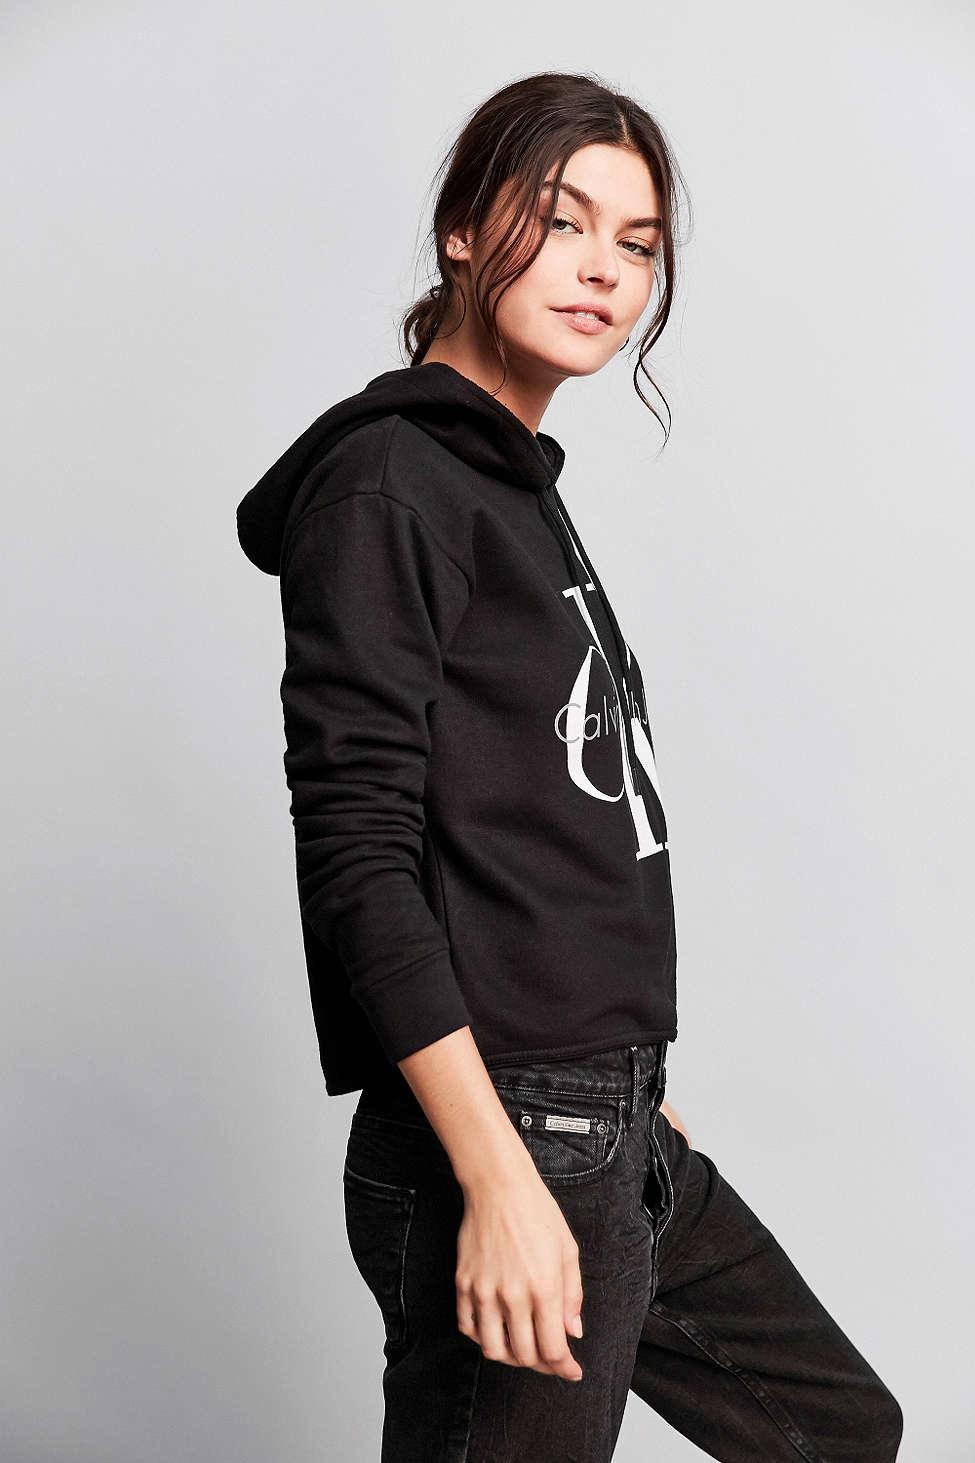 Calvin Klein For UO 90s Cropped Hoodie Sweatshirt